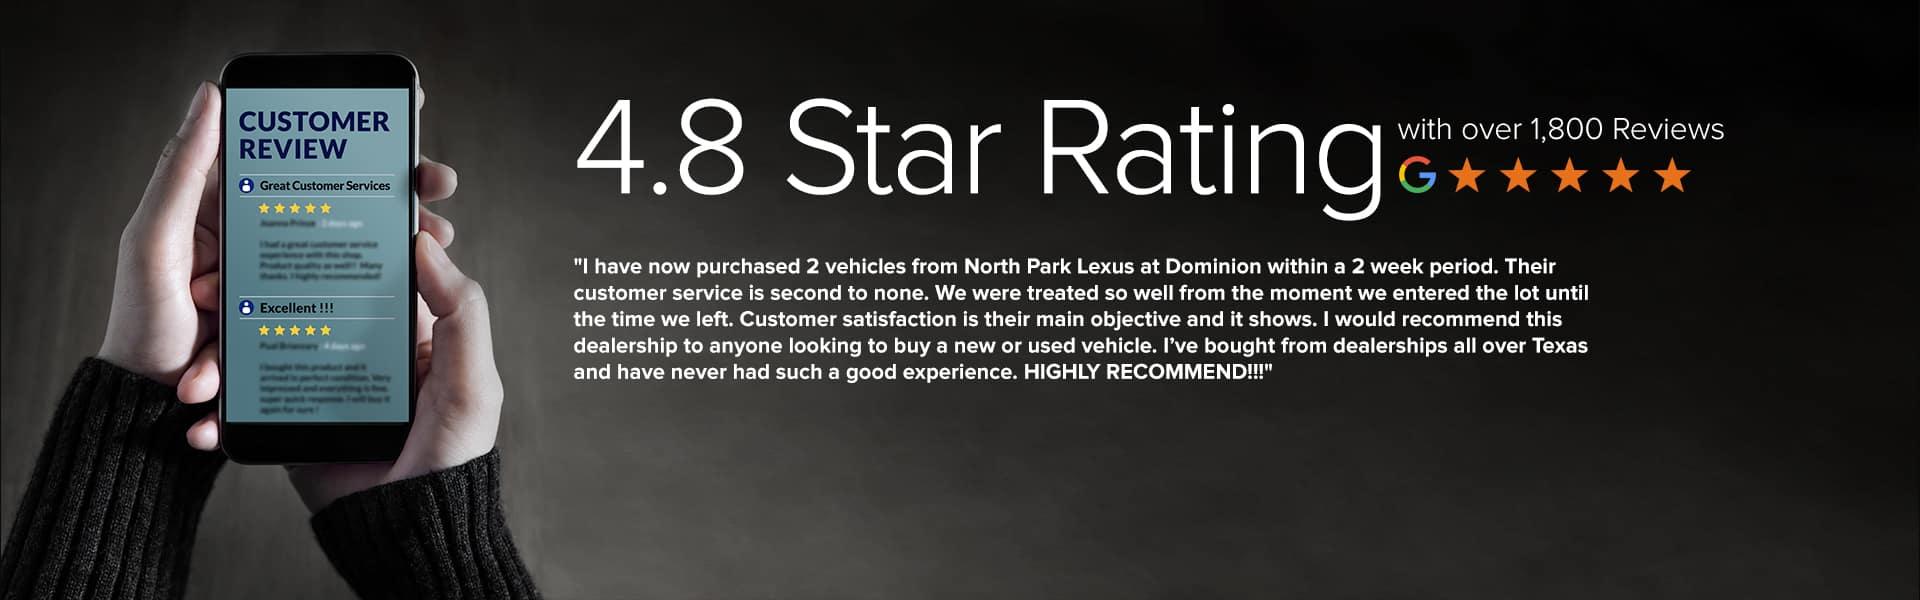 Ratings-slide-mar-21